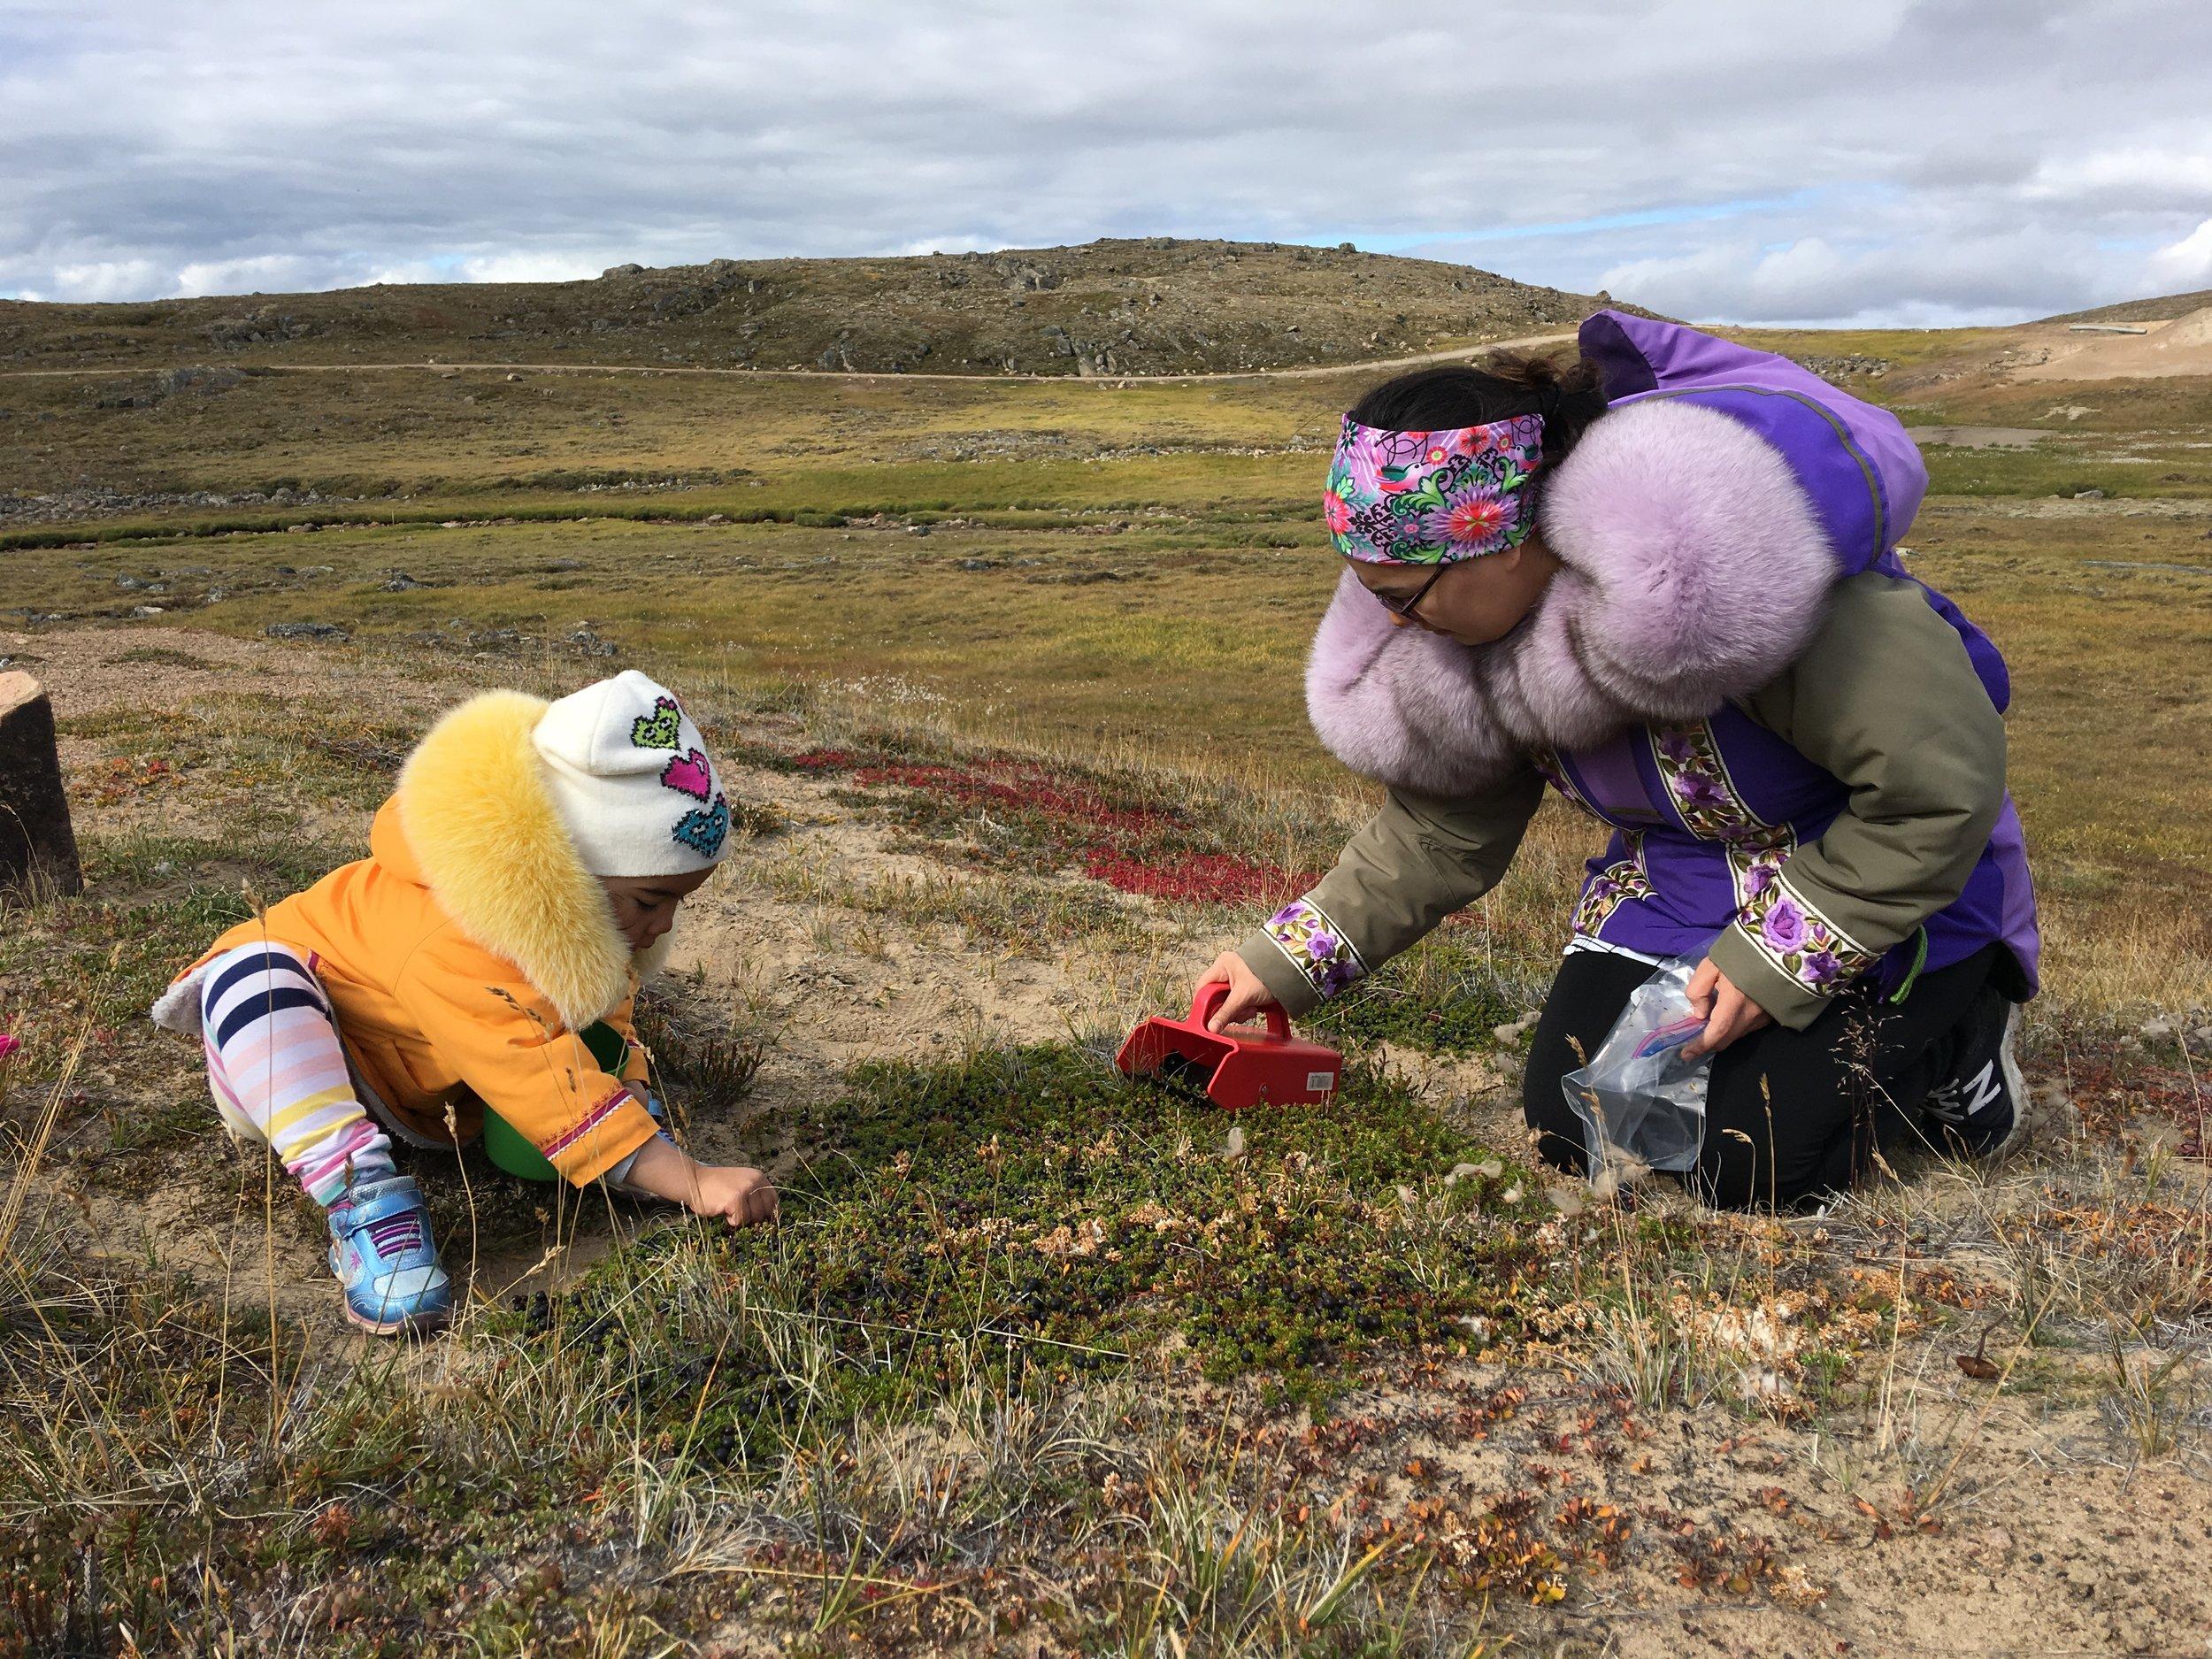 'Mother-Daughter' by Eetuk Groves, Iqaluit